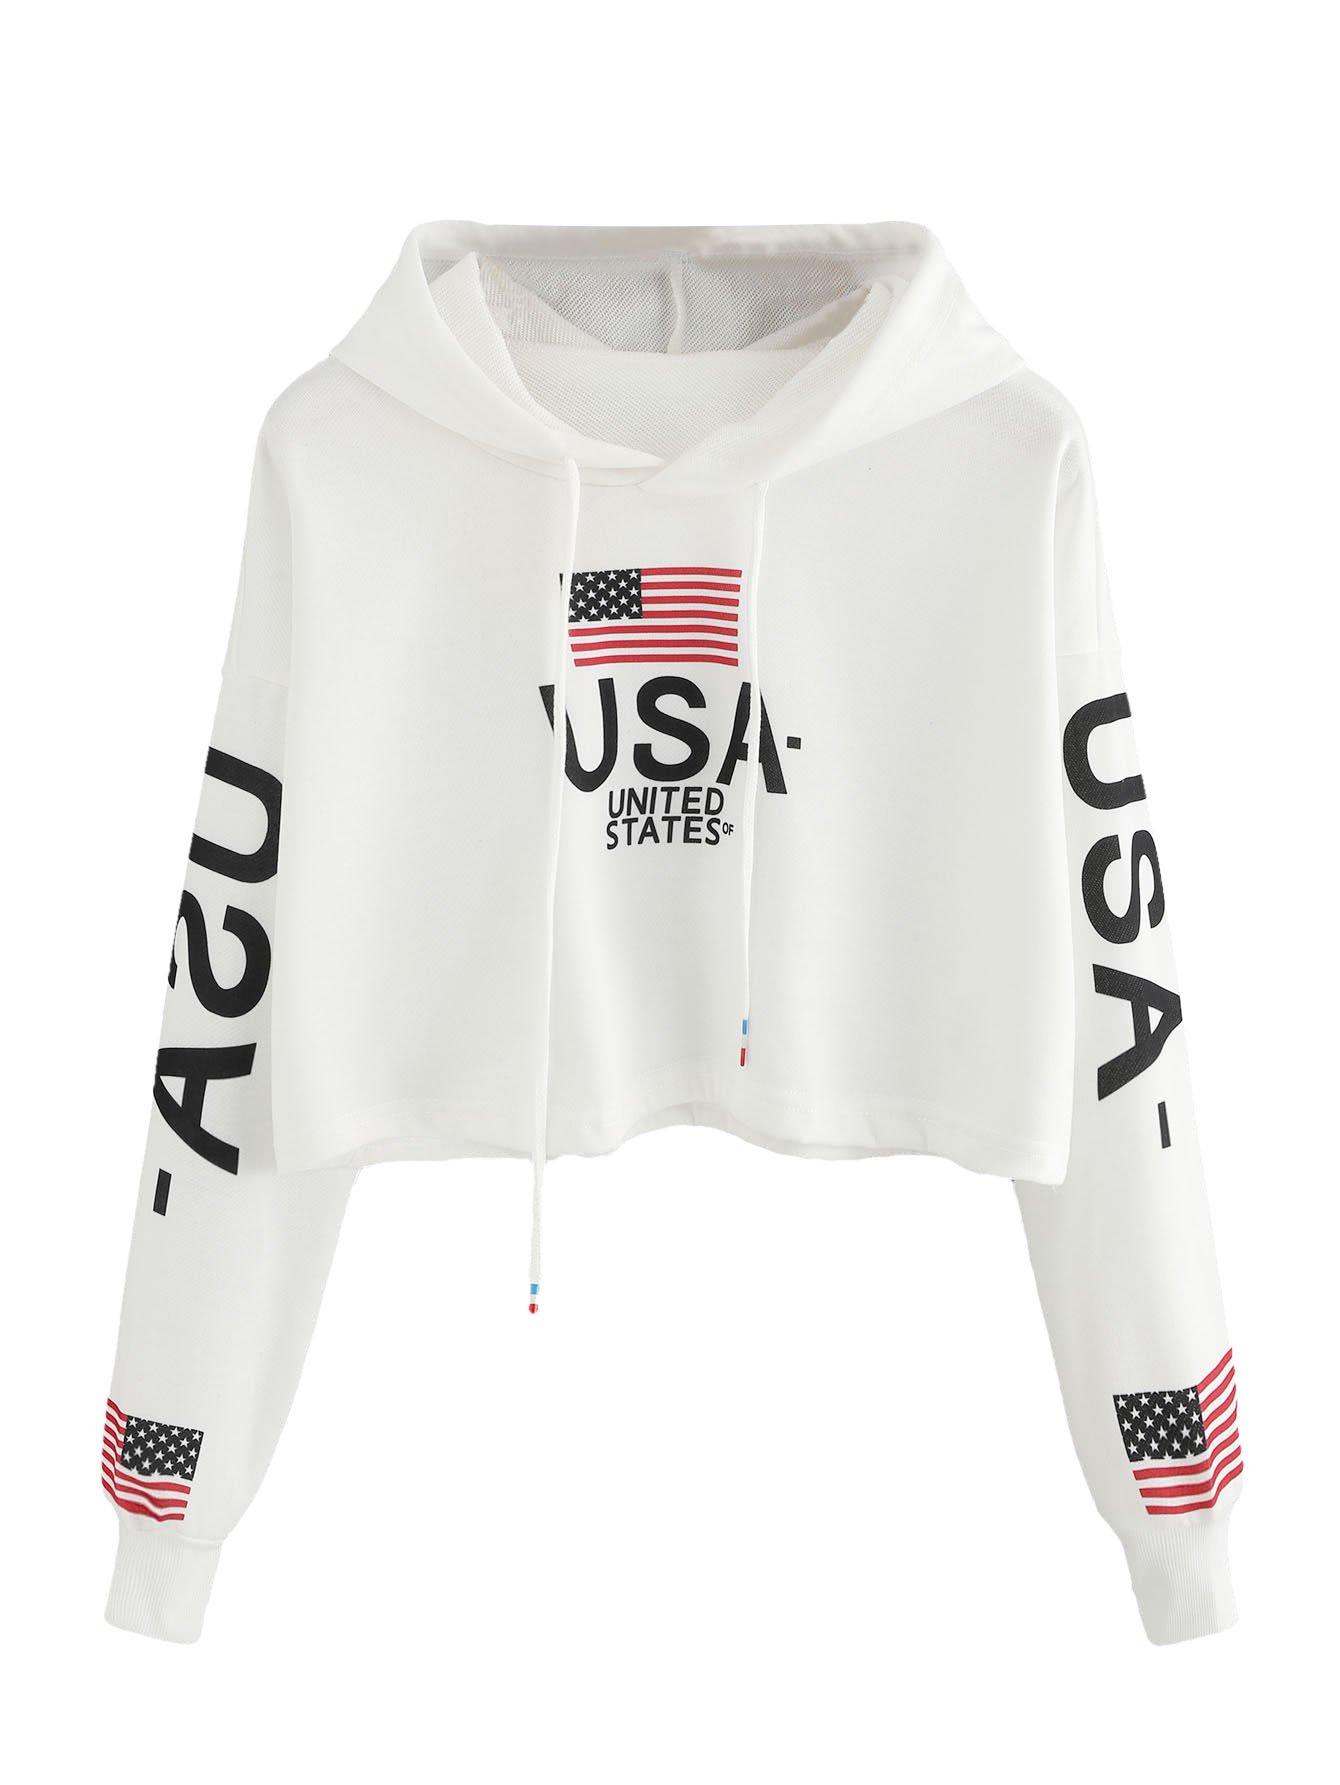 MakeMeChic Women's Round Neck Casual Letter Print Striped Crop Sweatshirt Top White-Hoodie S